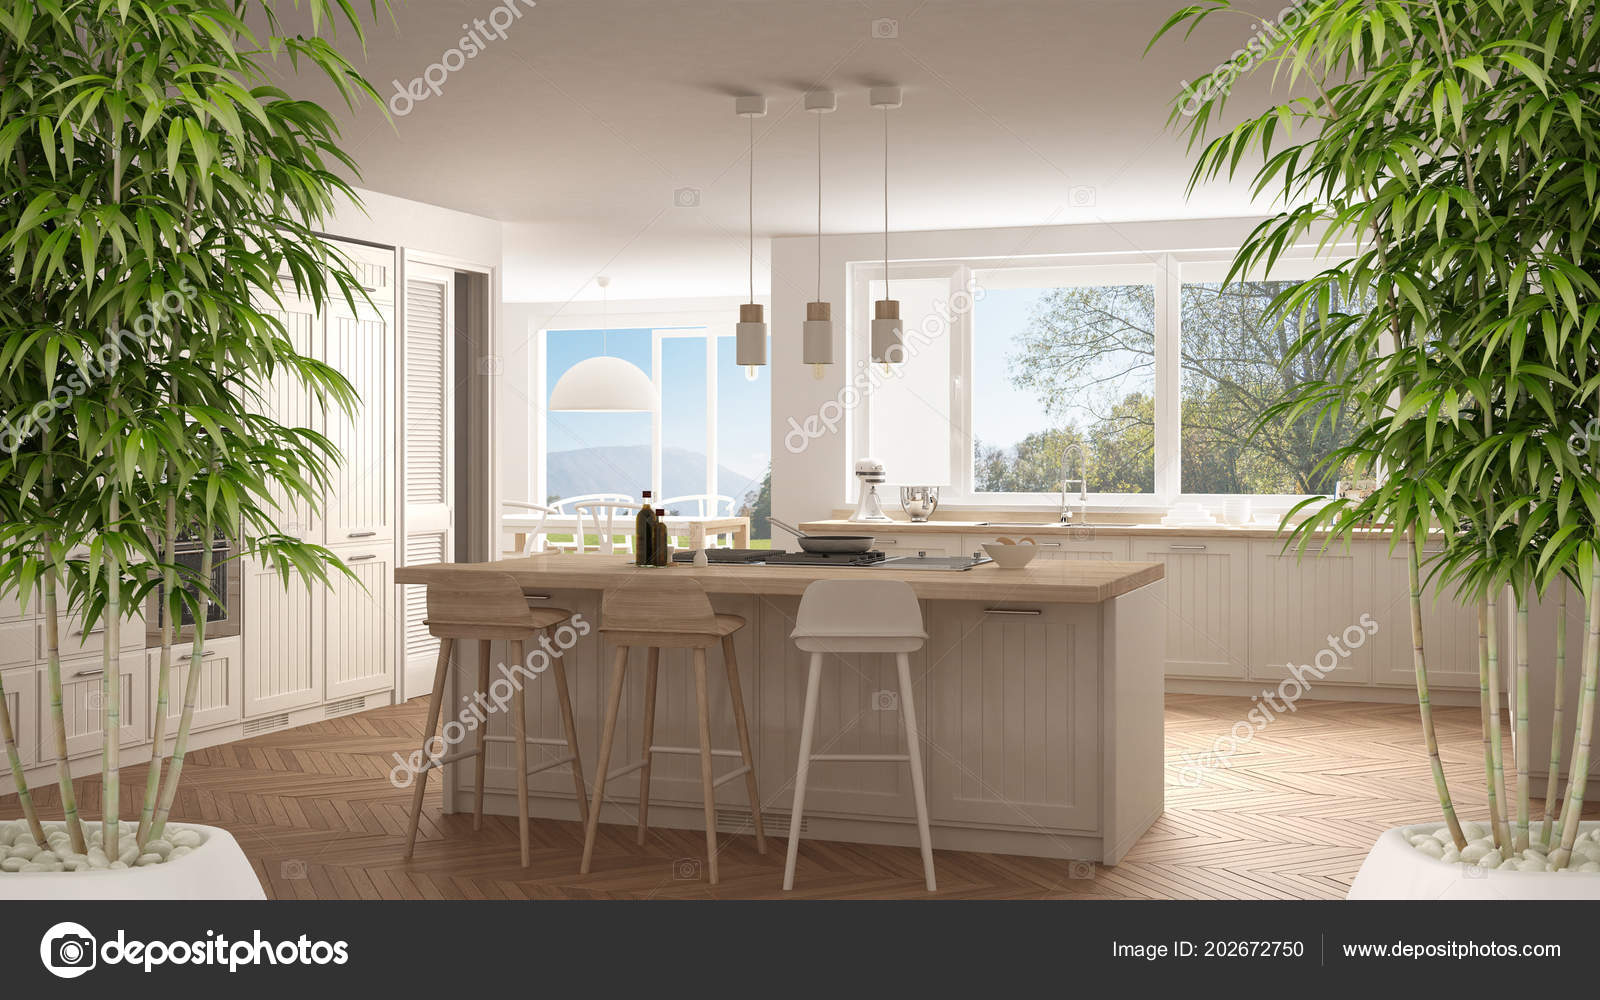 540+ Foto Interior Design Zen Concept Paling Keren Yang Bisa Anda Tiru